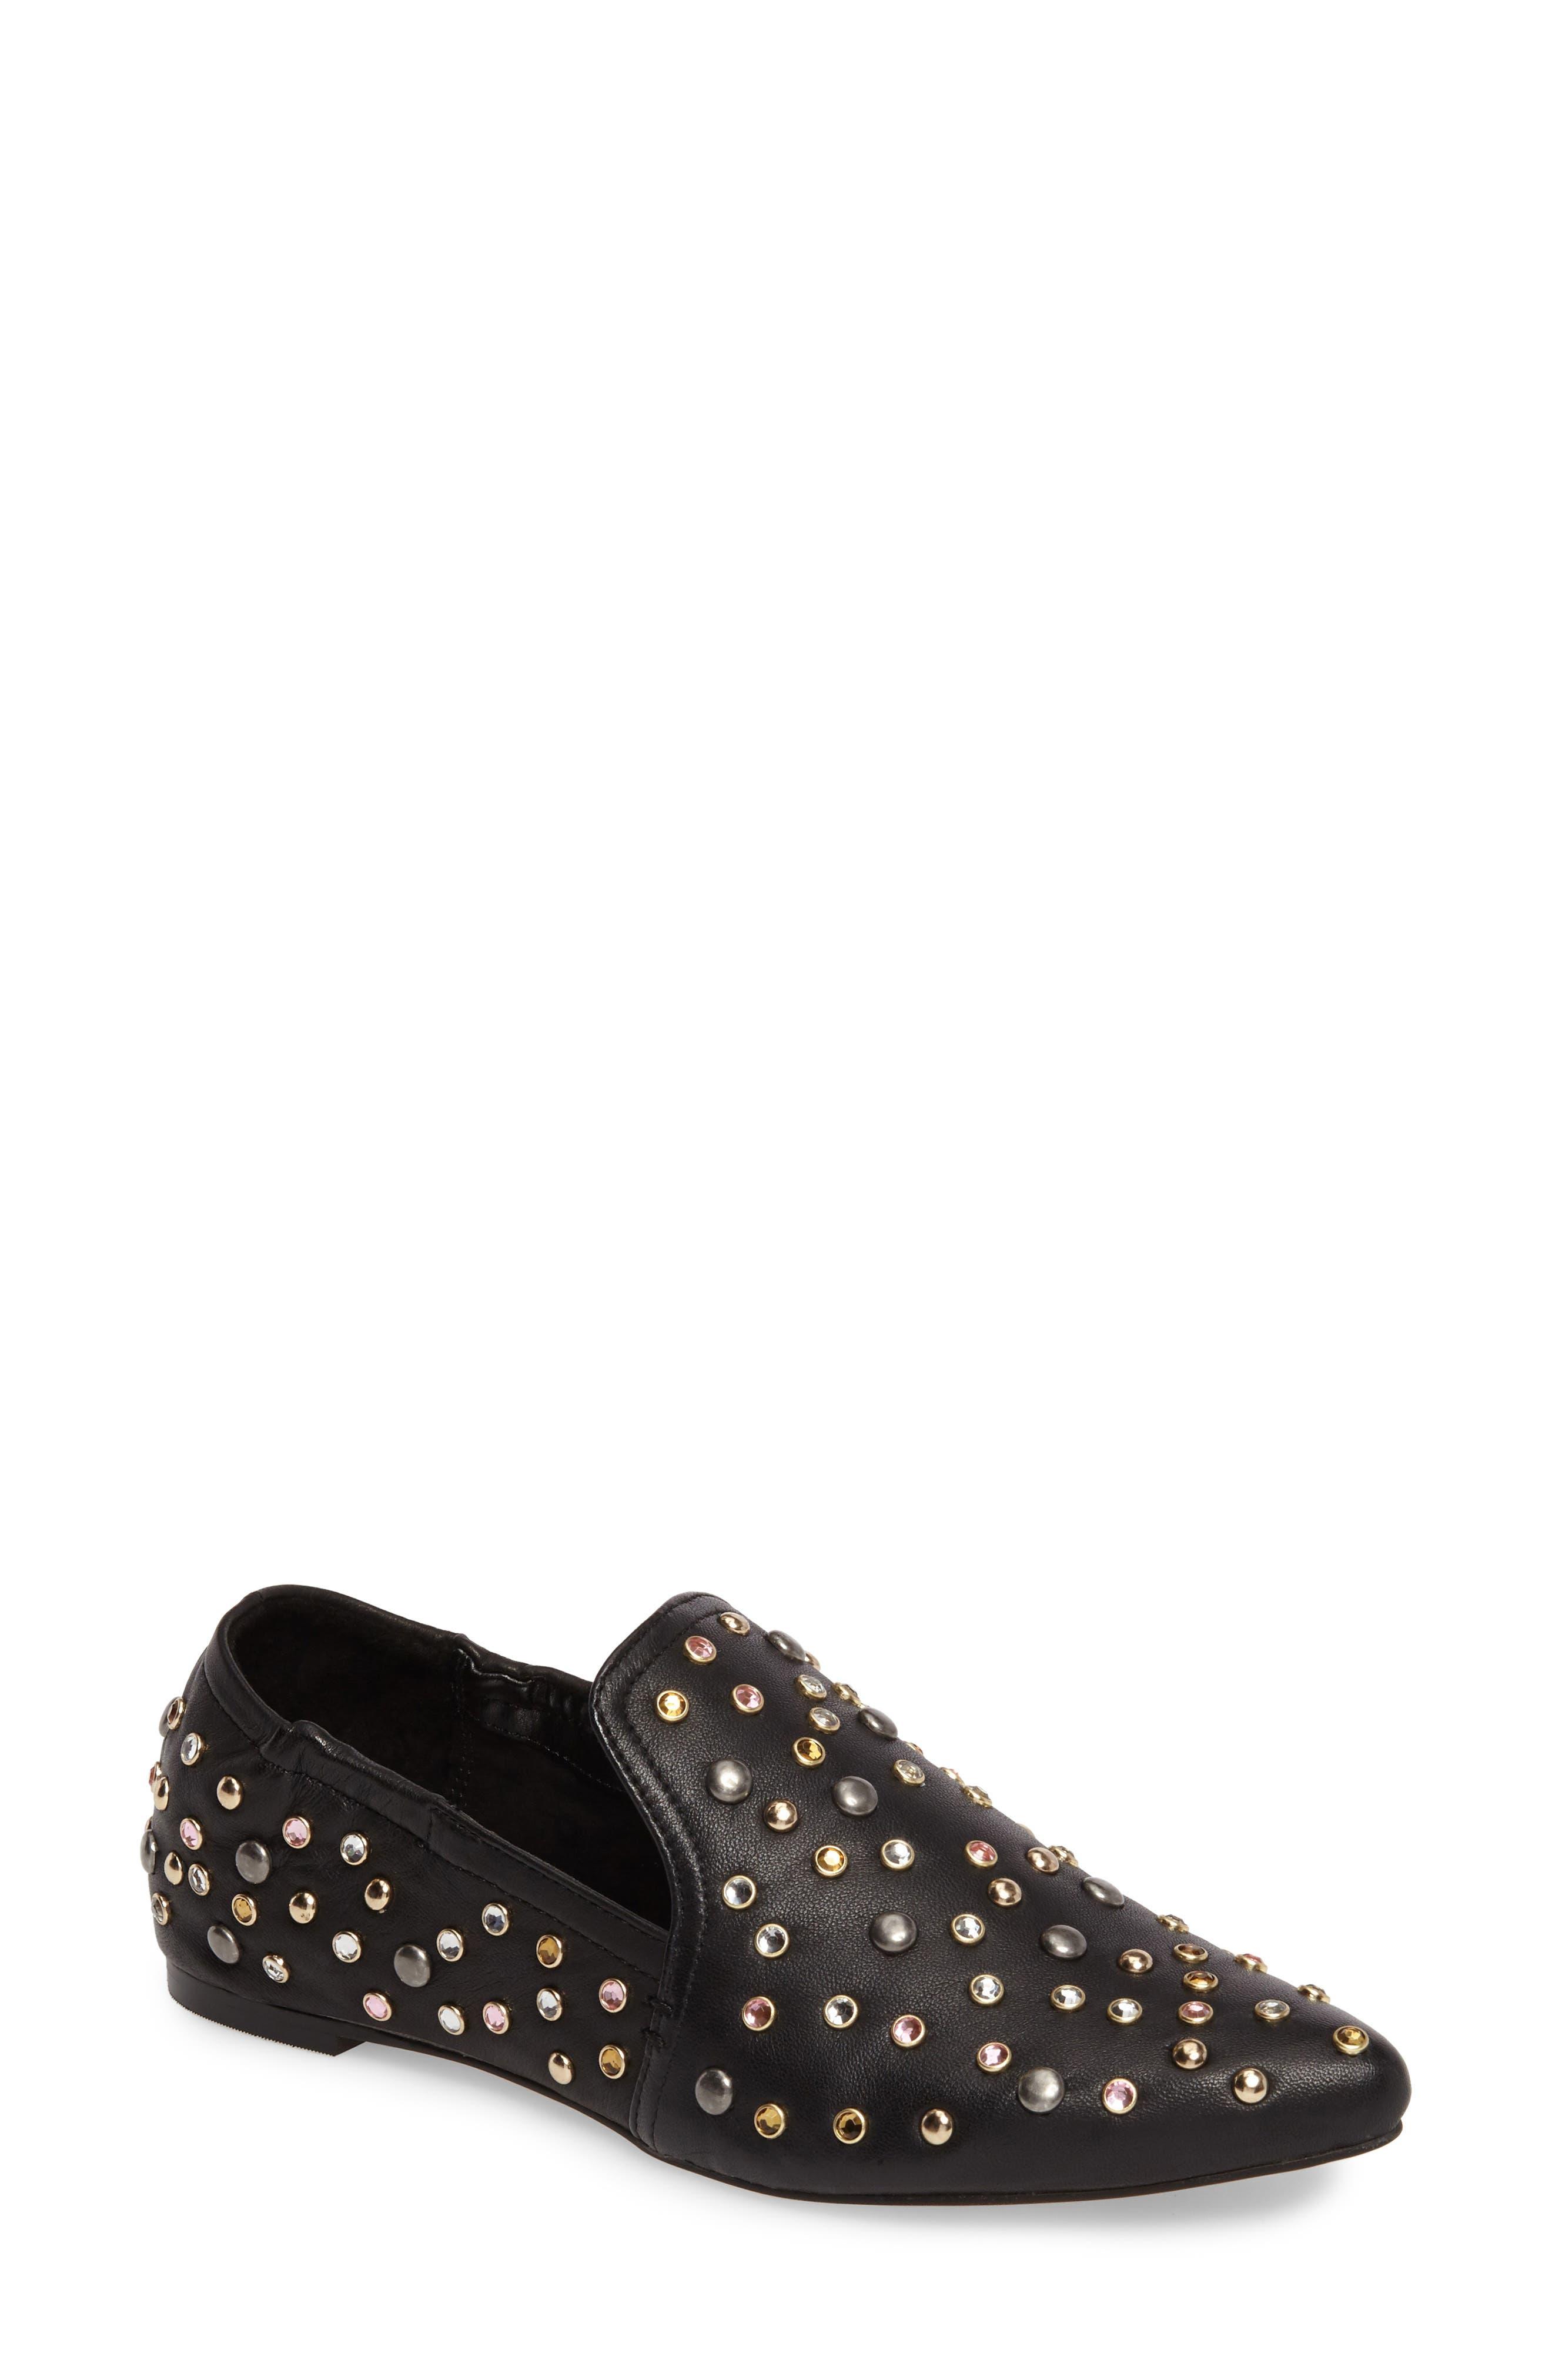 Main Image - Dolce Vita Hamond Stud Embellished Loafer Flat (Women)